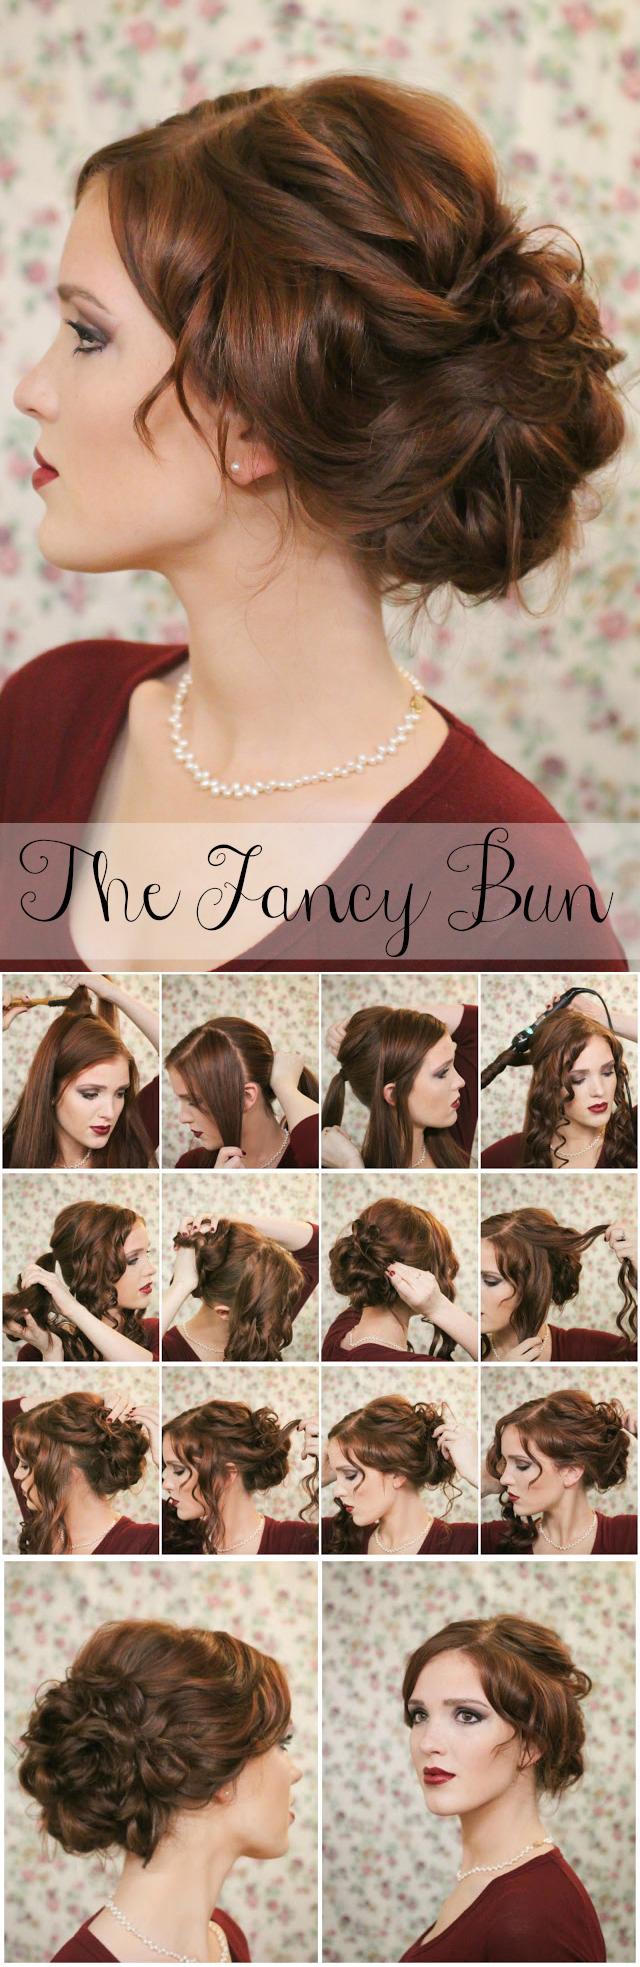 Oh-So-Simple Bun Hairstyles Tutorials: The Fancy Bun